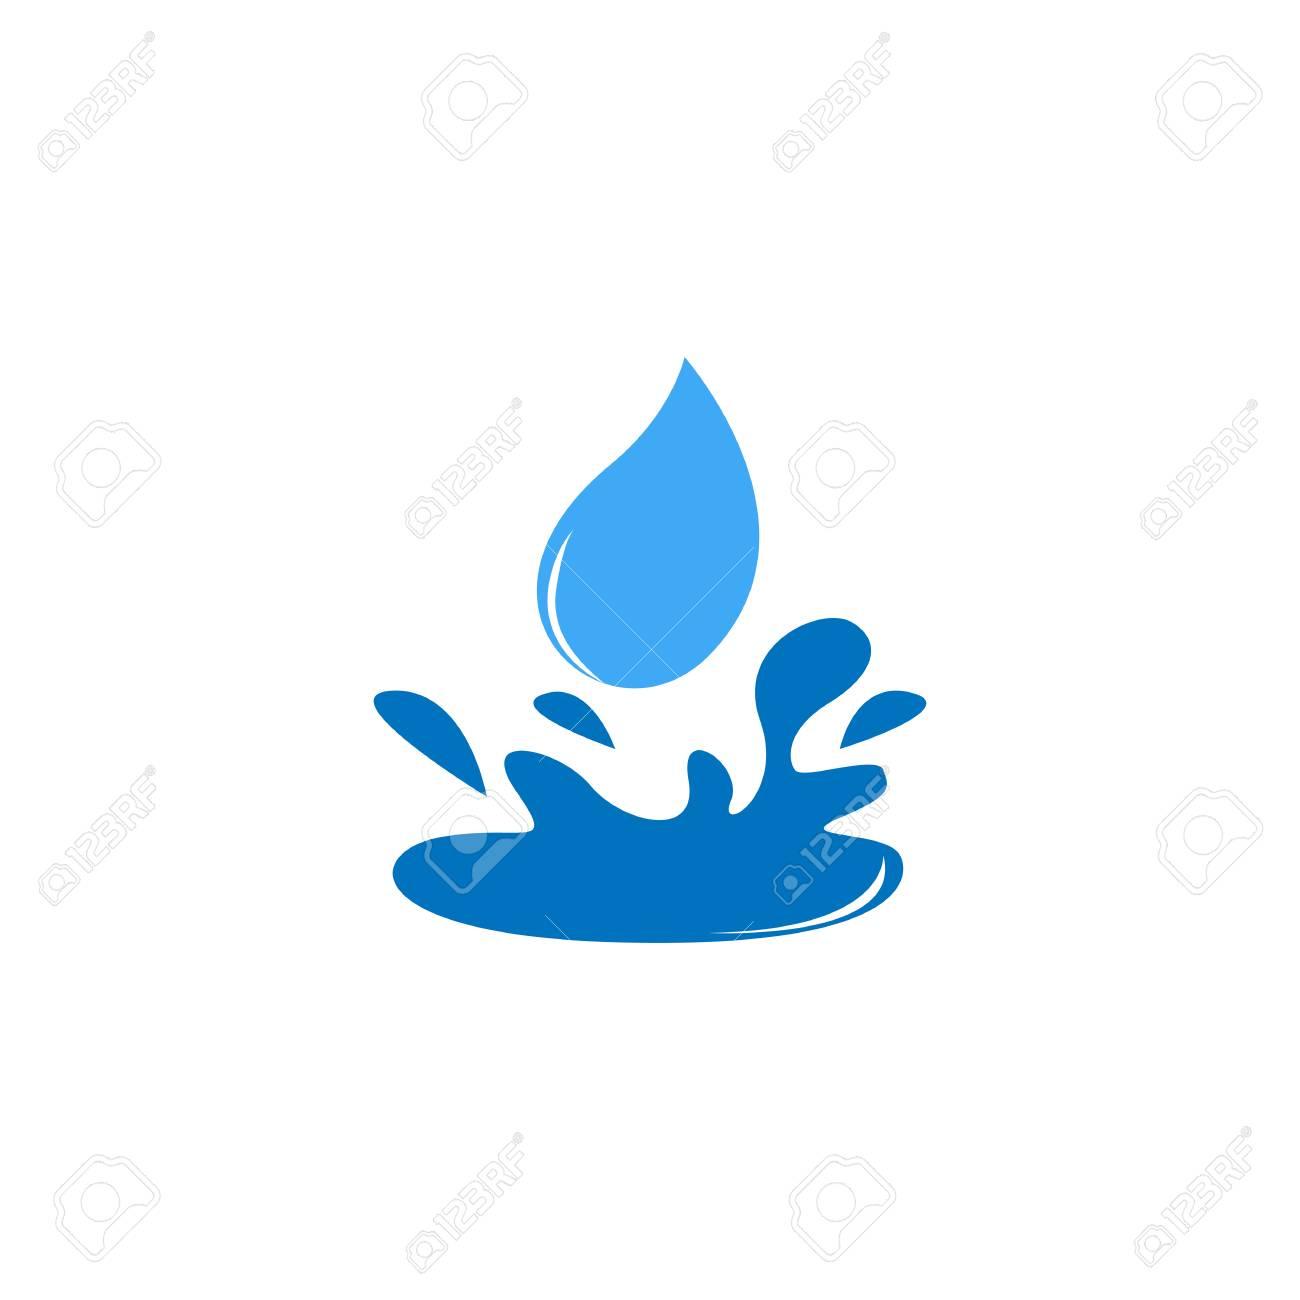 water drop splash icon logo design element royalty free cliparts